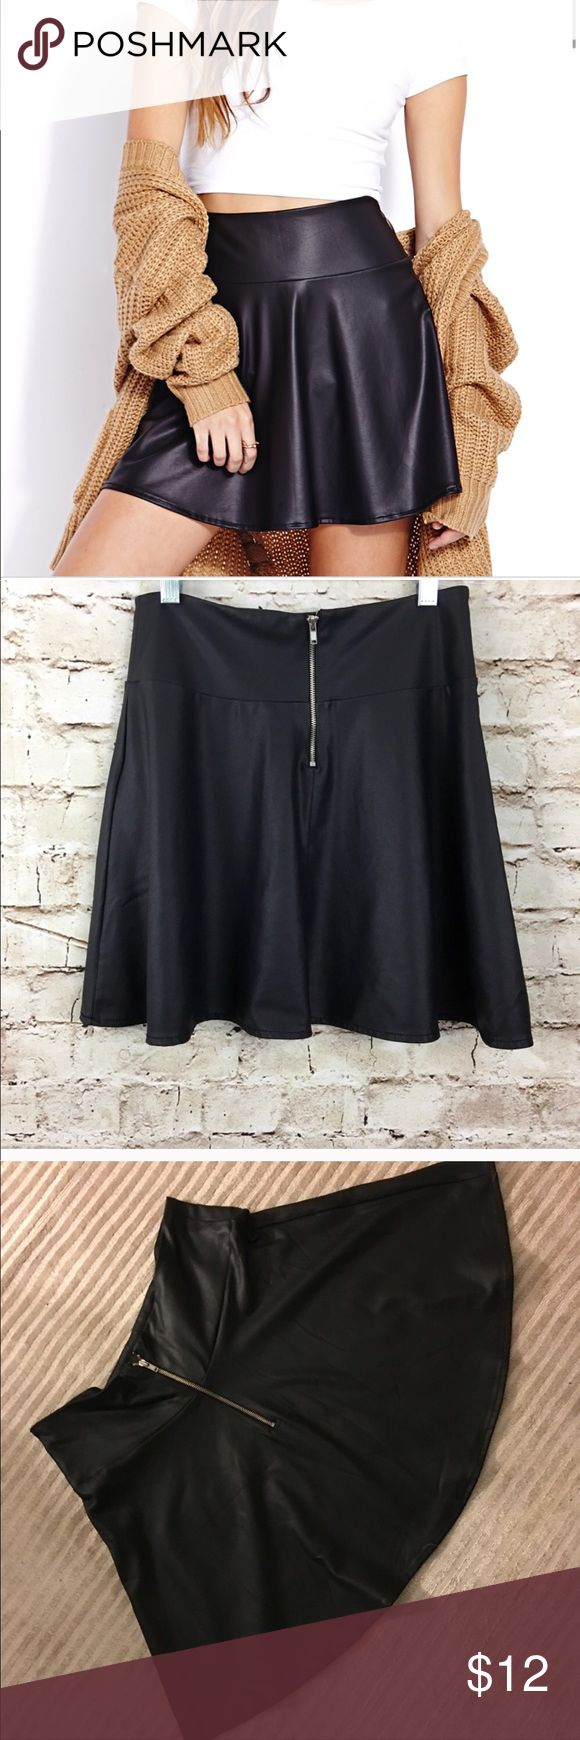 Leather Skater Skirt Black Never Worn In excellent condition Forever 21 Skirts Circle & Skater